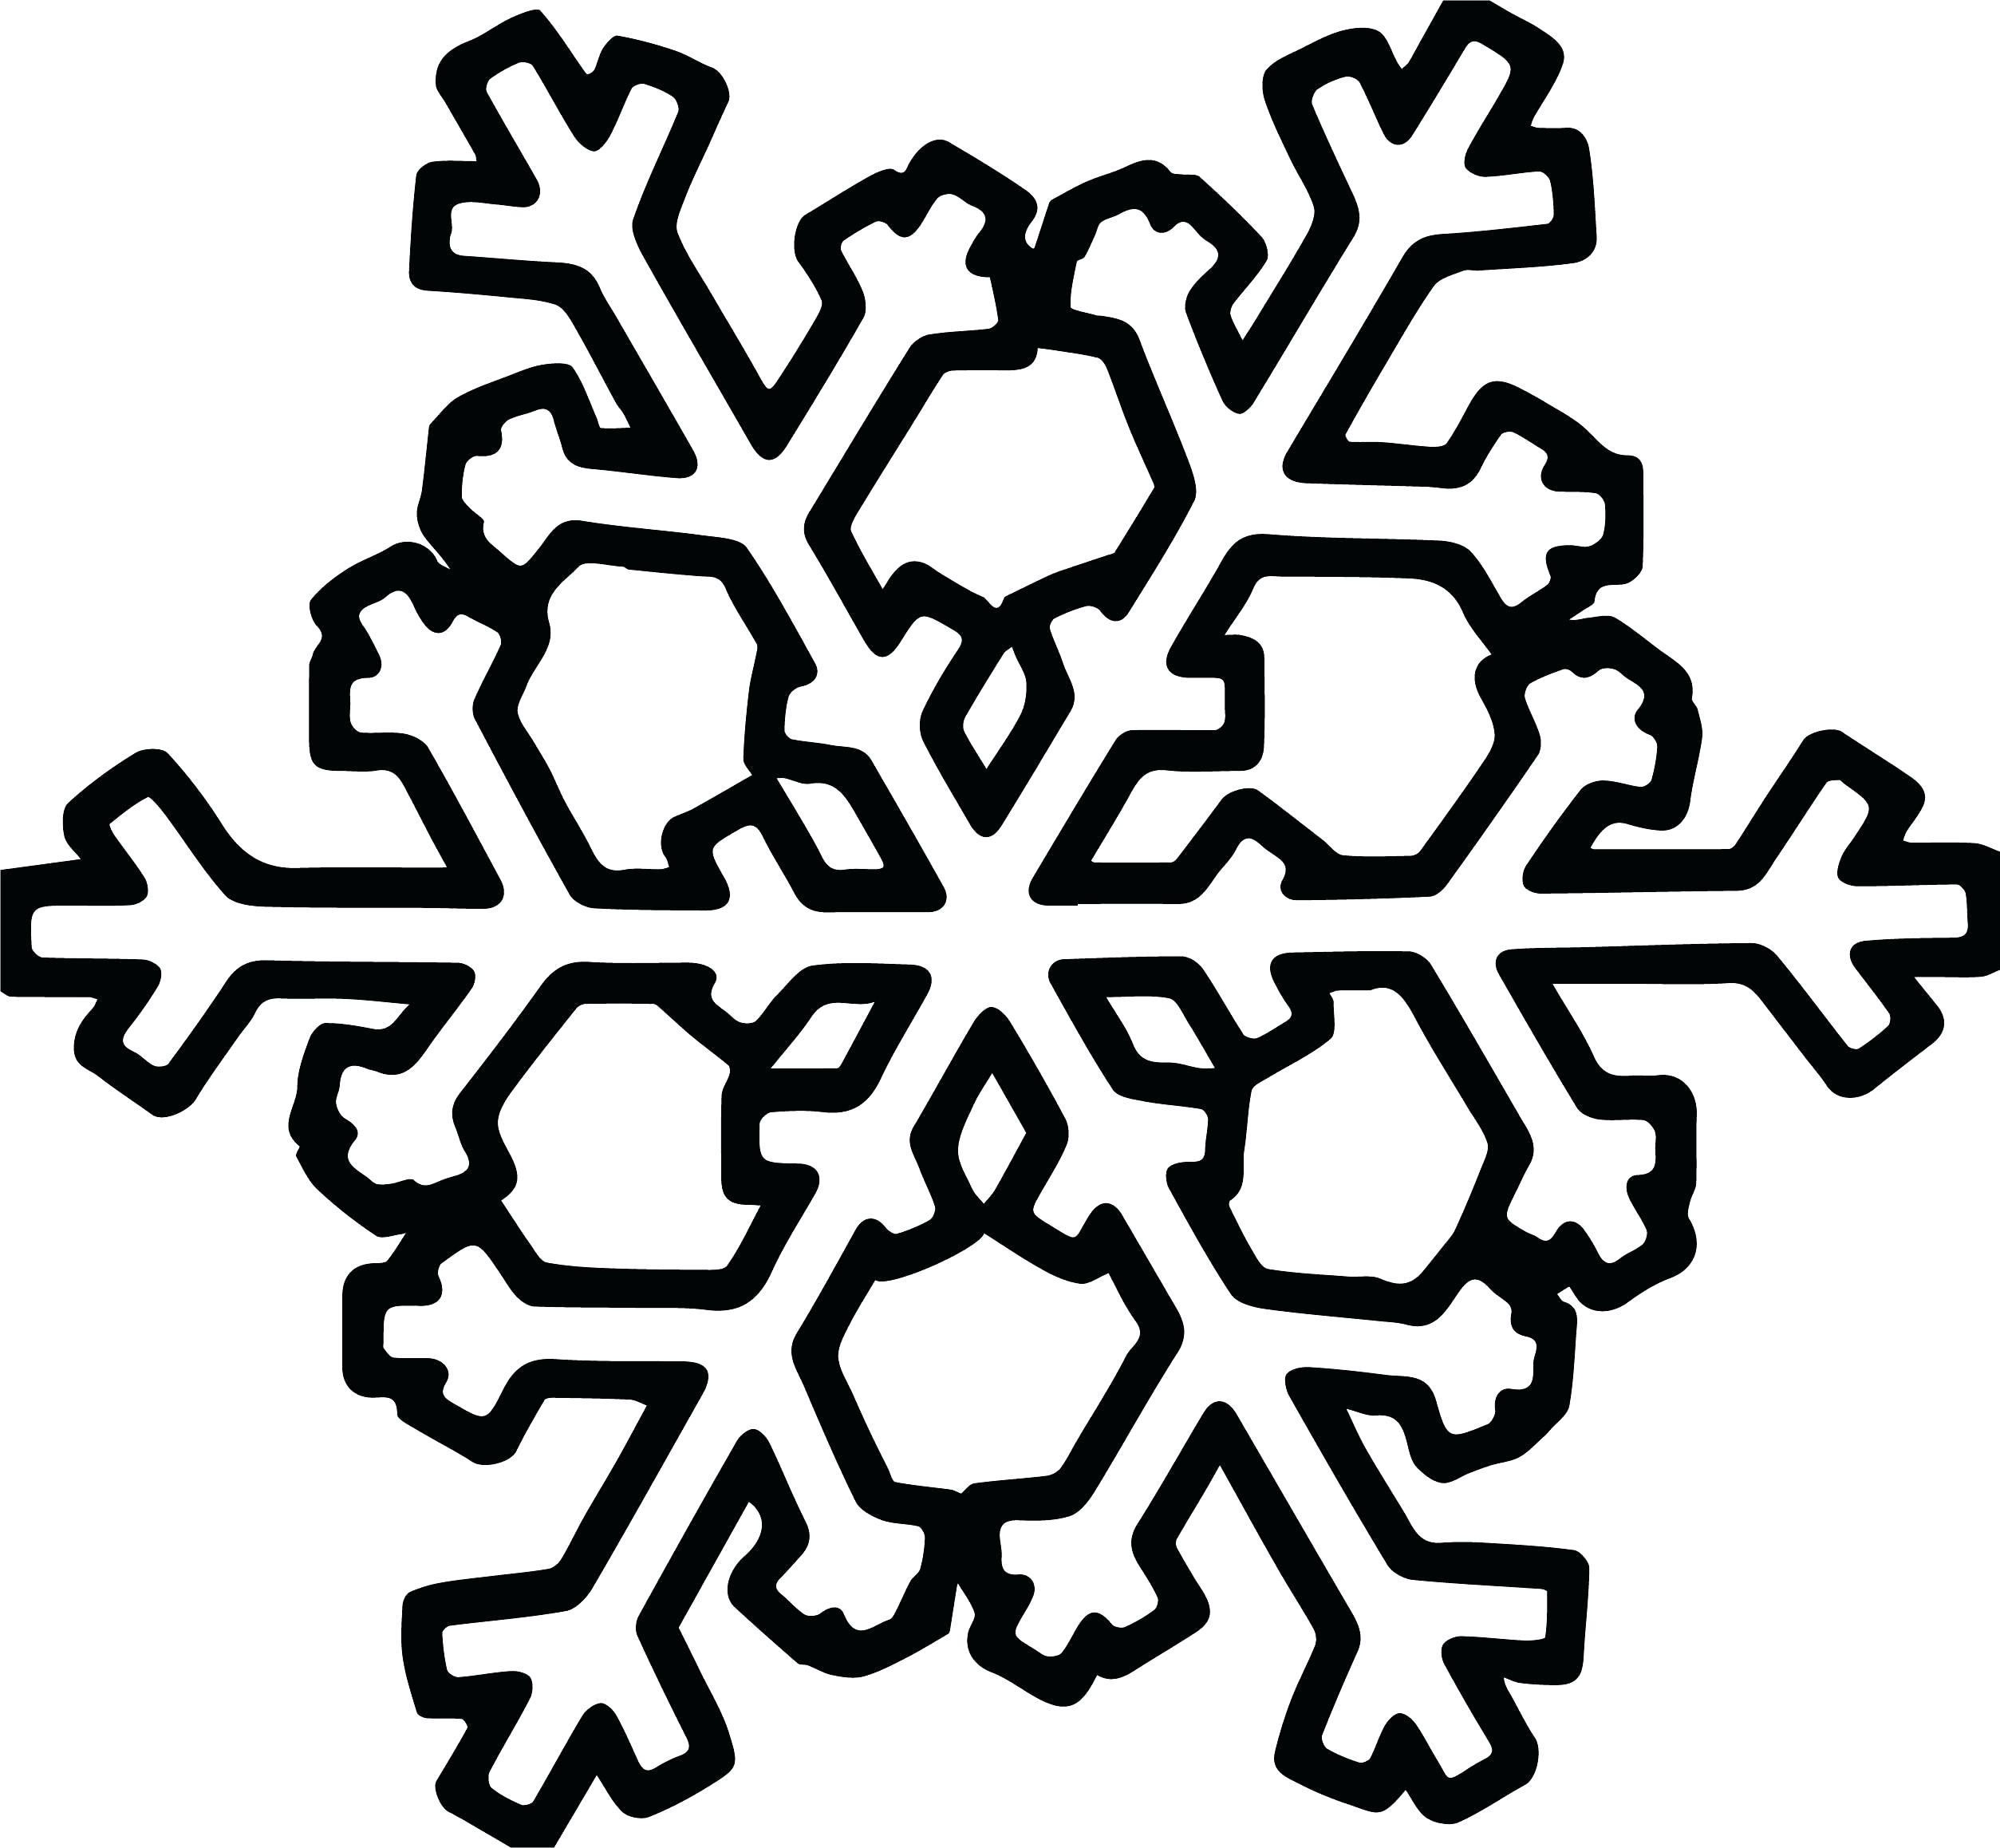 Snowflake Drawing Simple at GetDrawings | Free download